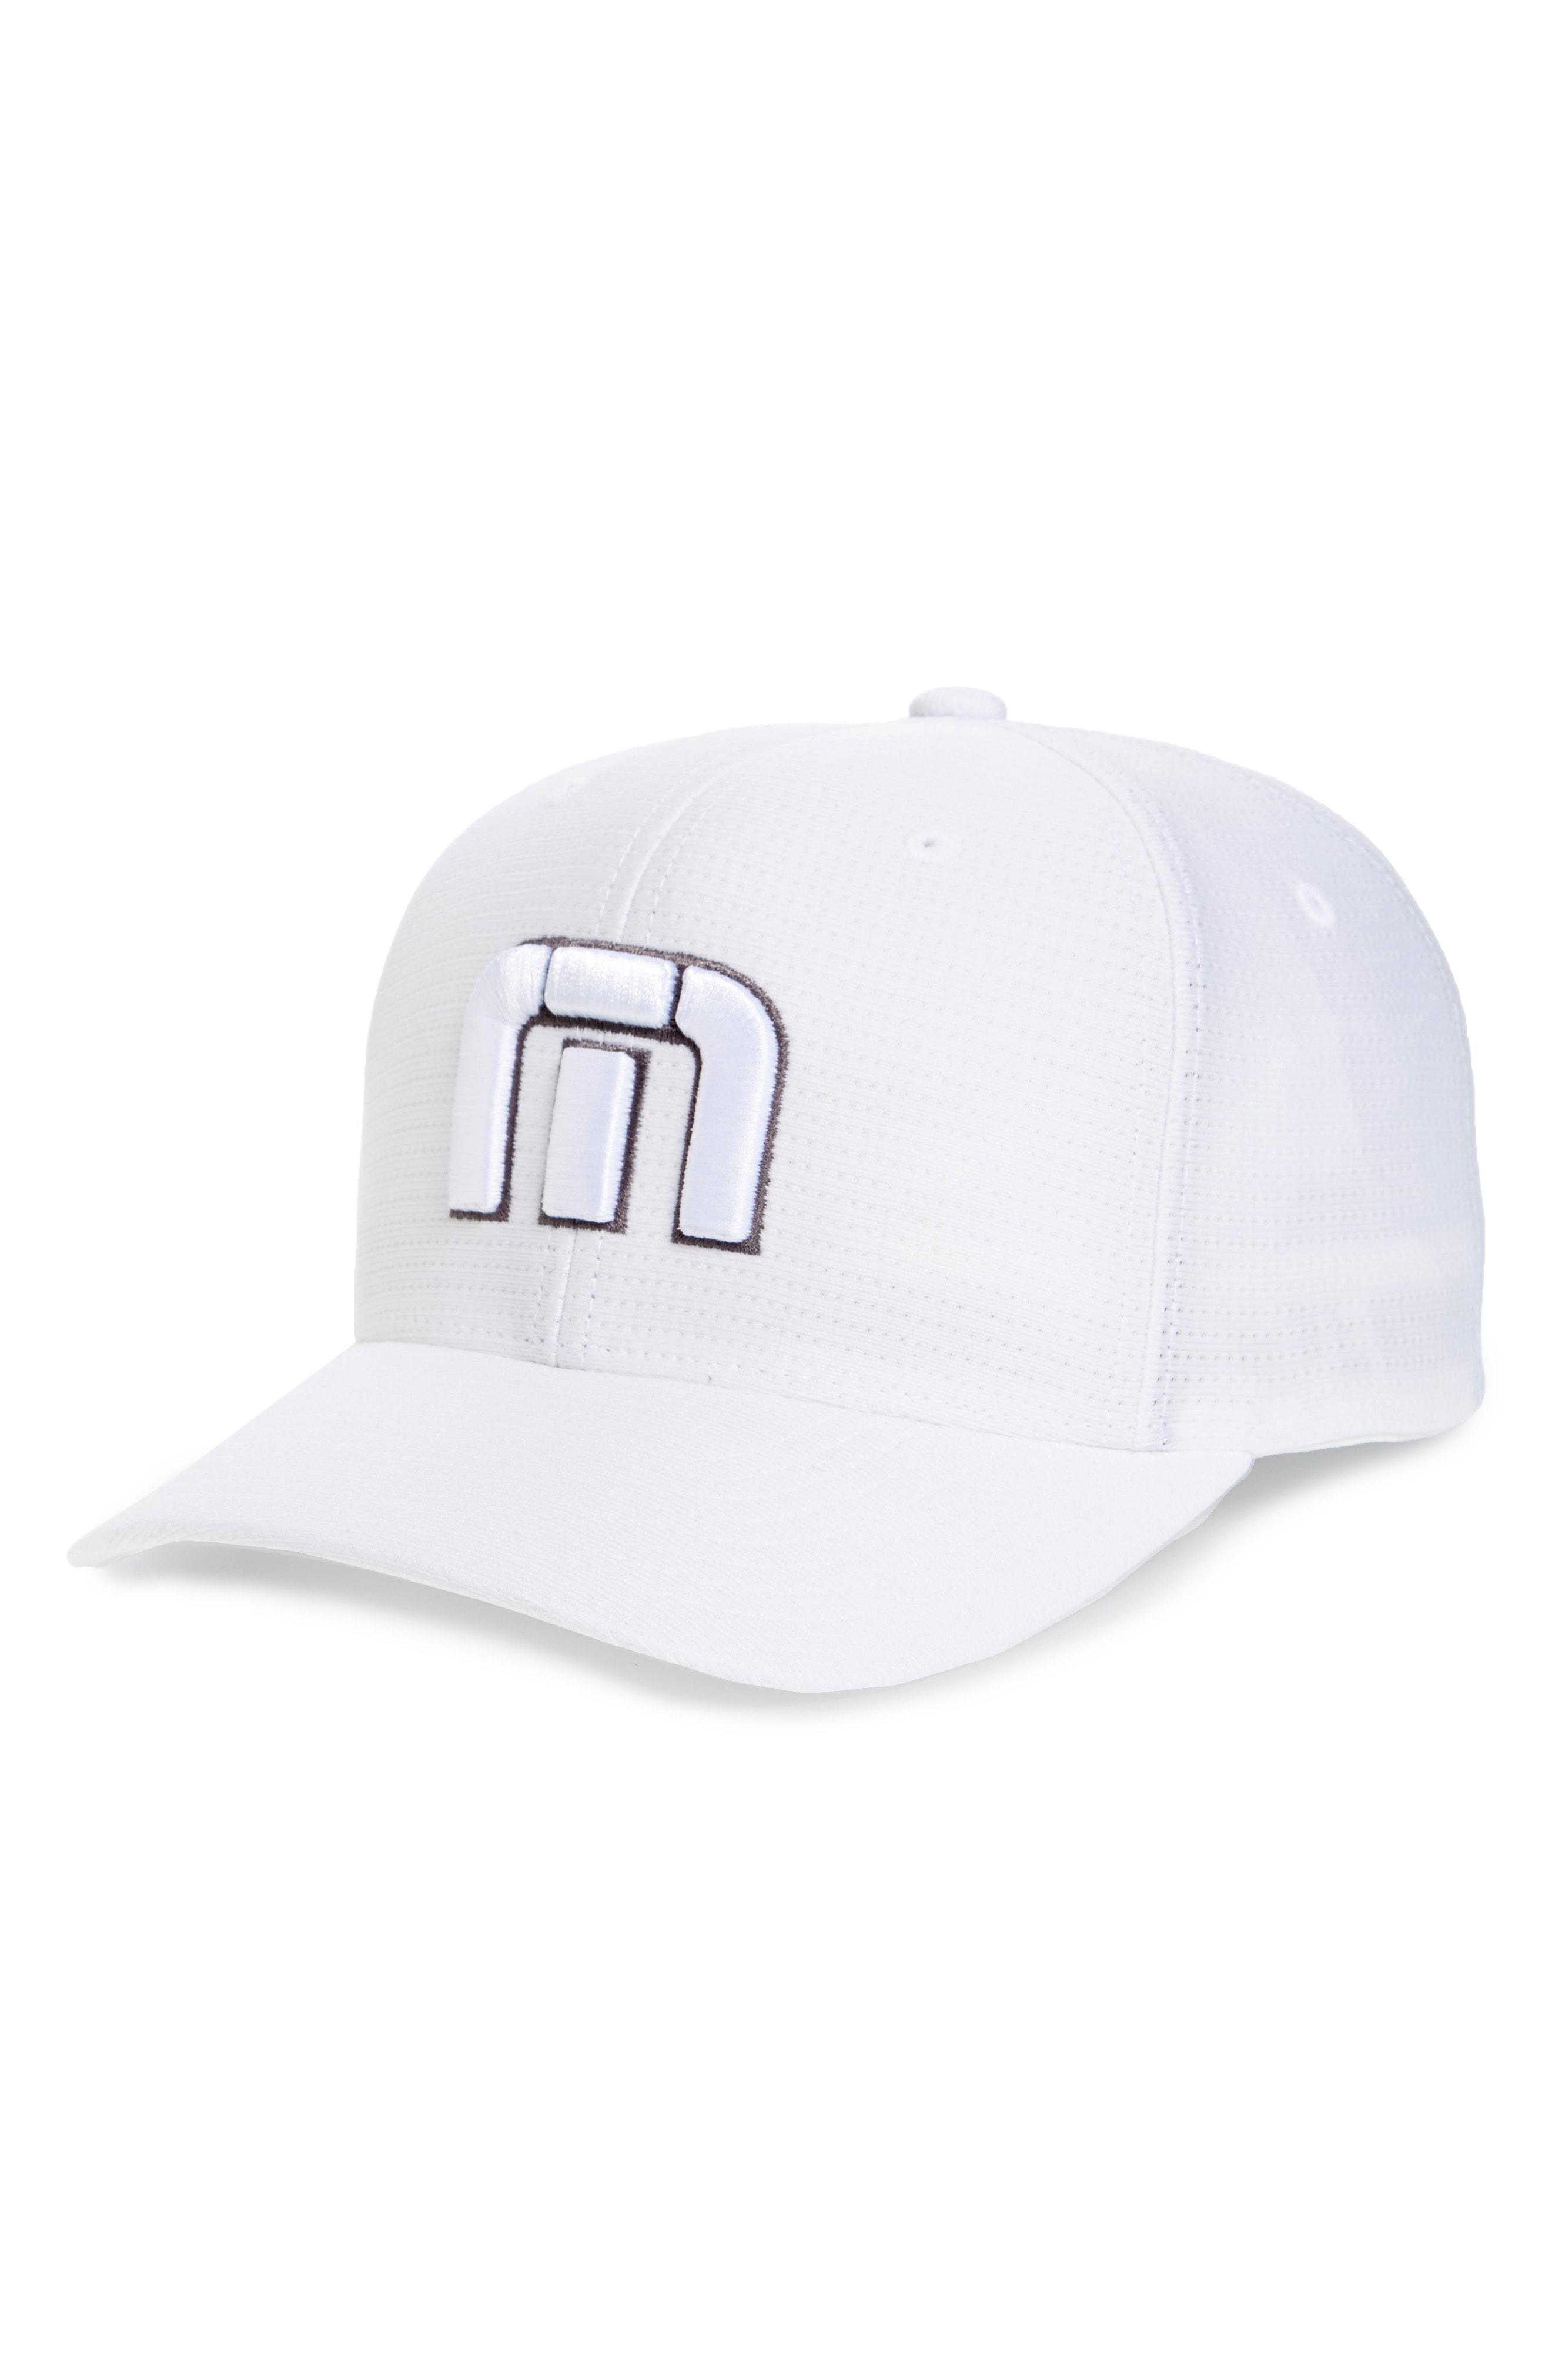 Lyst - Travis Mathew  b-bahamas  Hat in Black for Men - Save 7% ca957c4cb97e